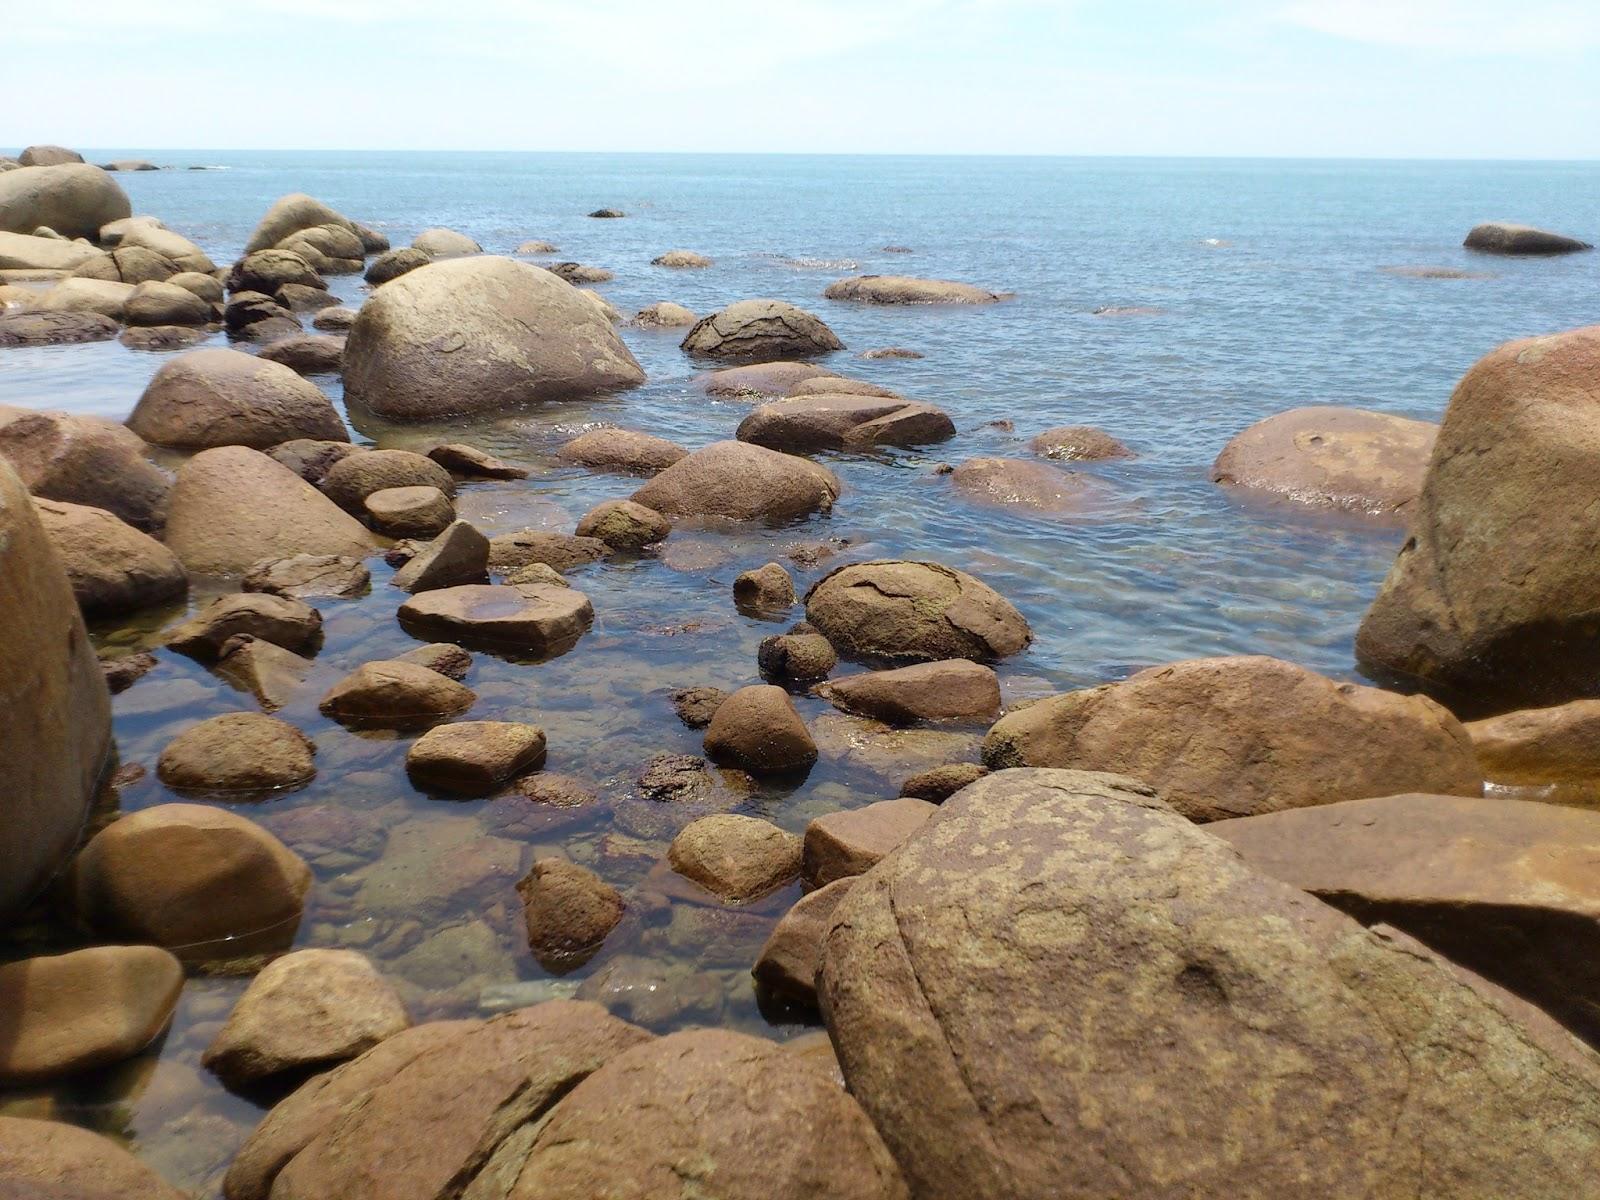 Objek Wisata Pantai Kura Bengkayang Kalimantan Kota Singkawang